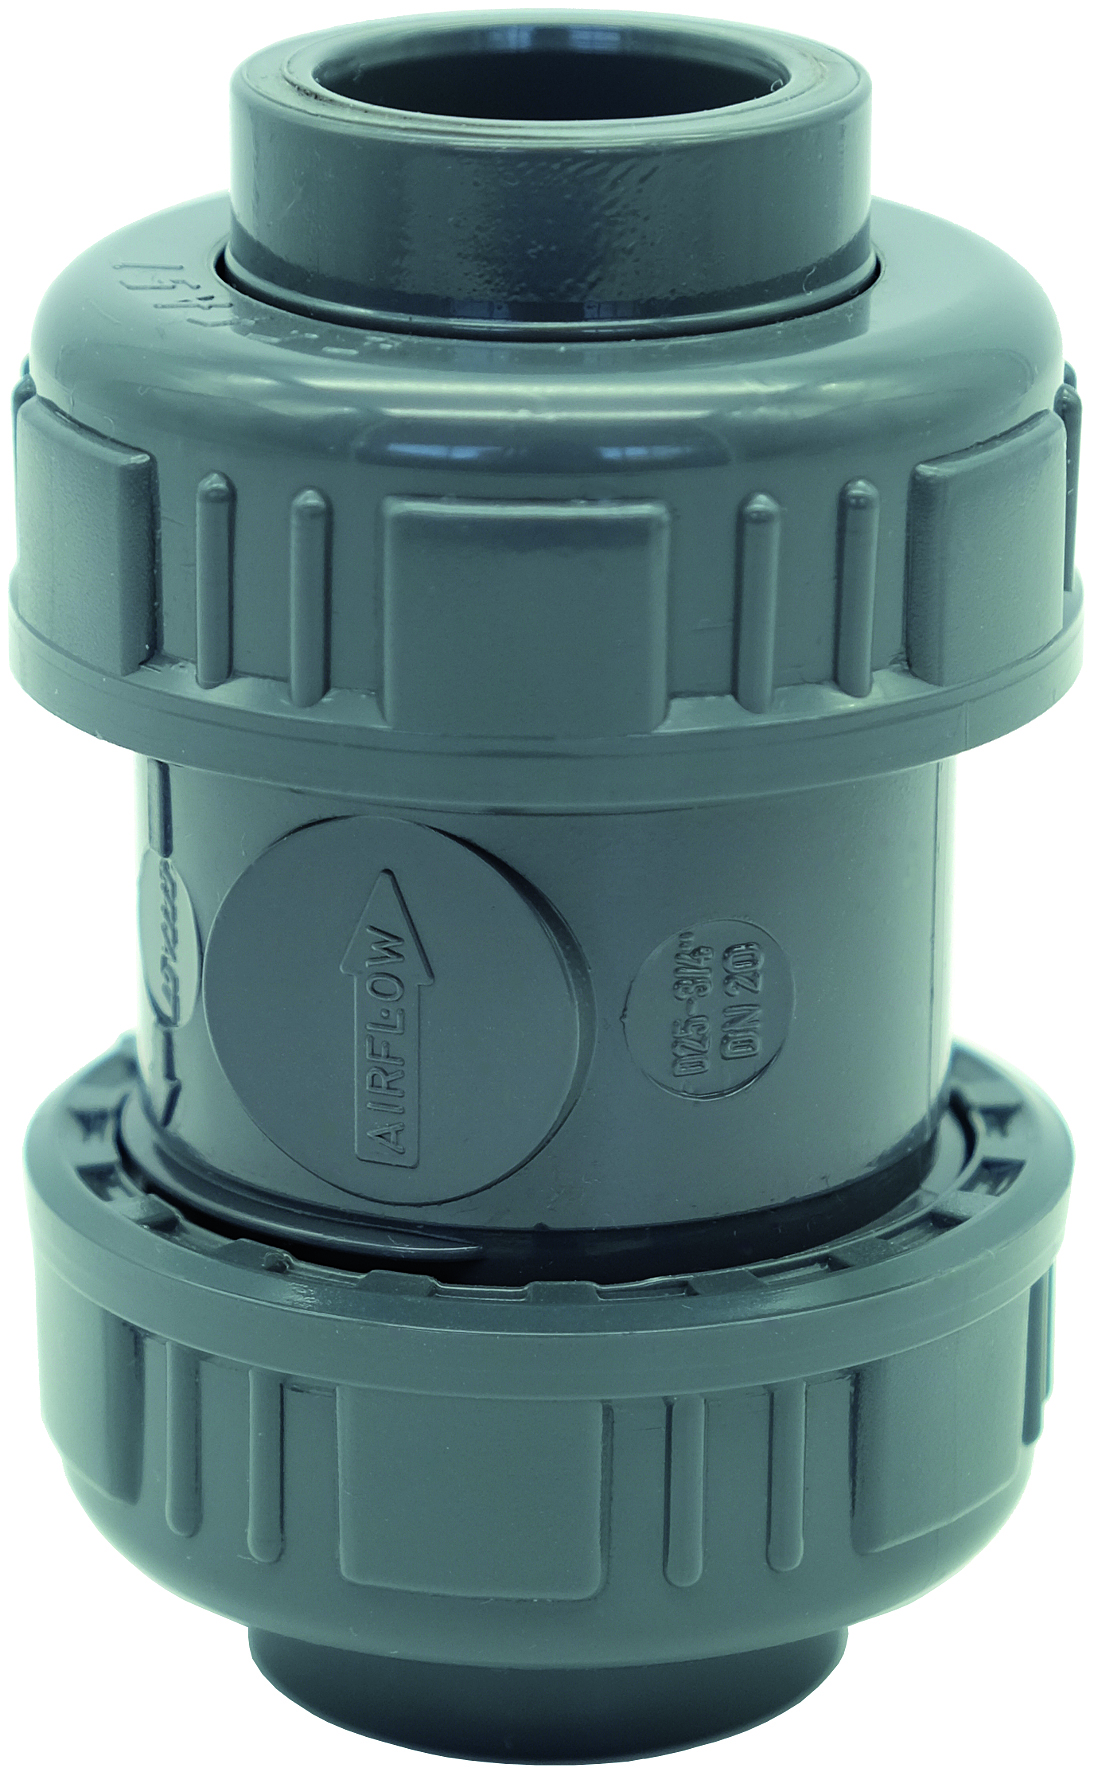 PVC-U air release valve AV - EFFAST - 100% Made in Italy